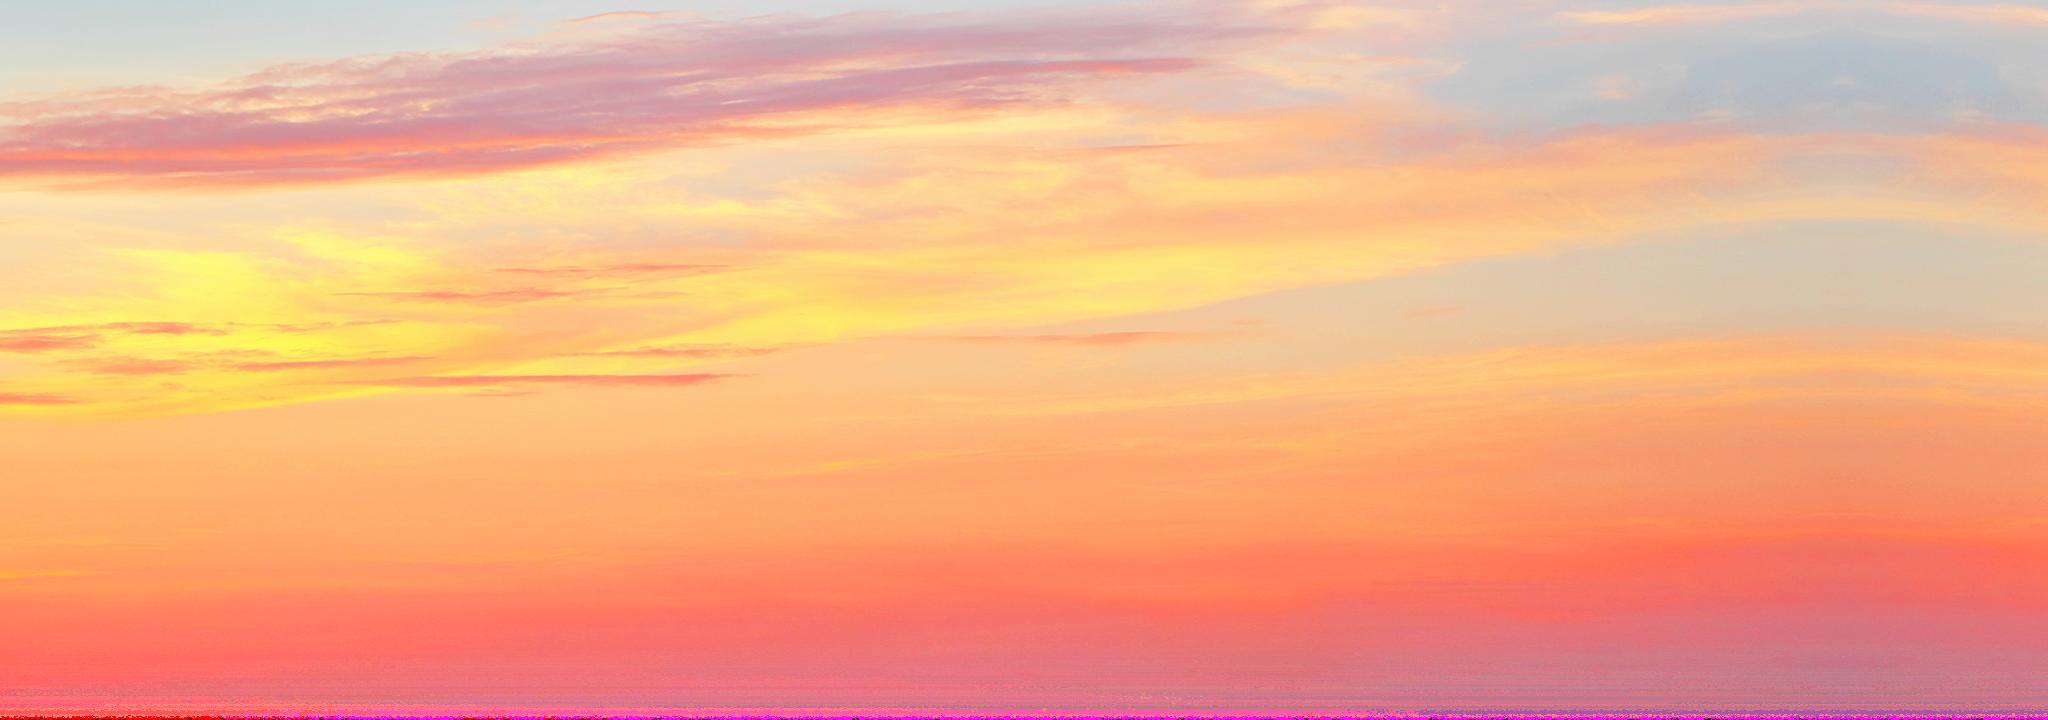 Sunset clipart sun set. Like